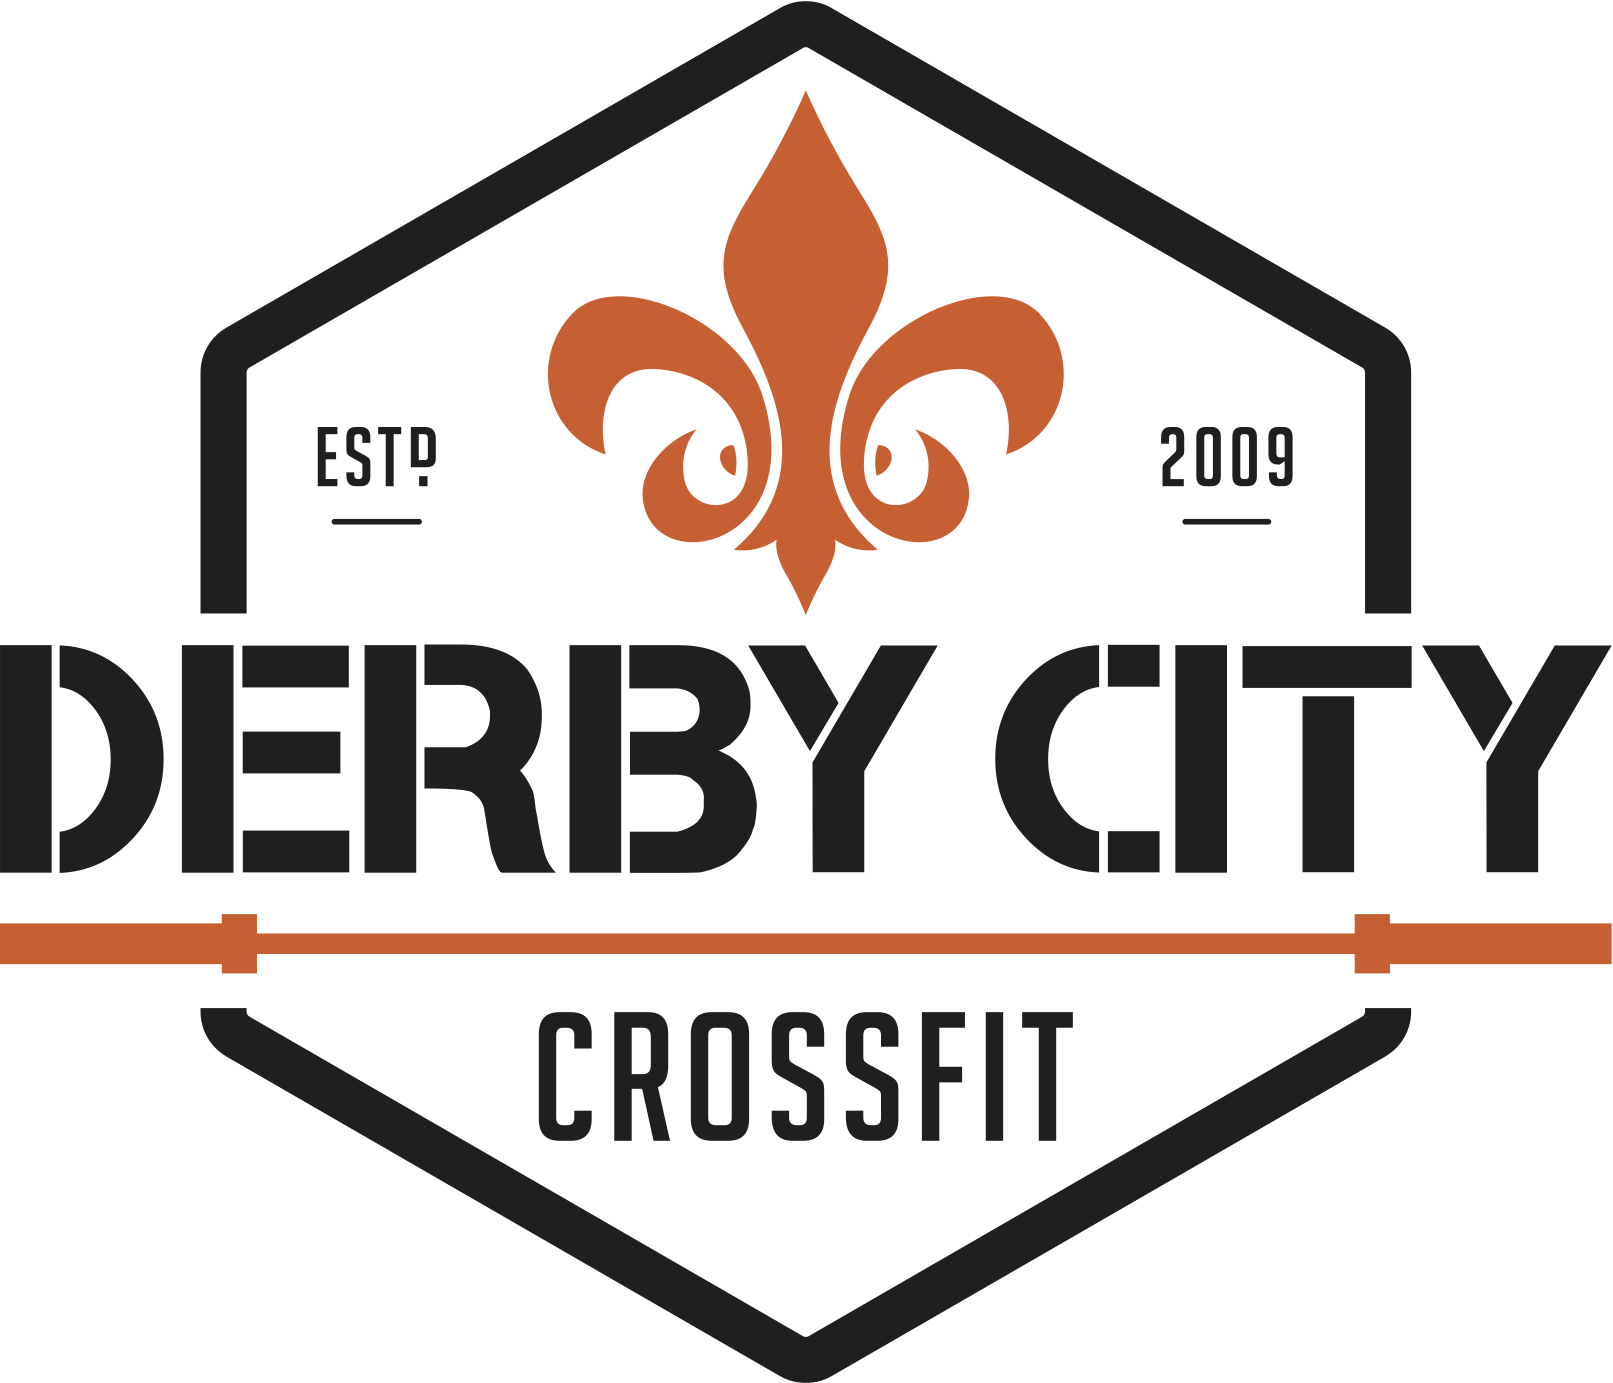 Derby City CrossFit